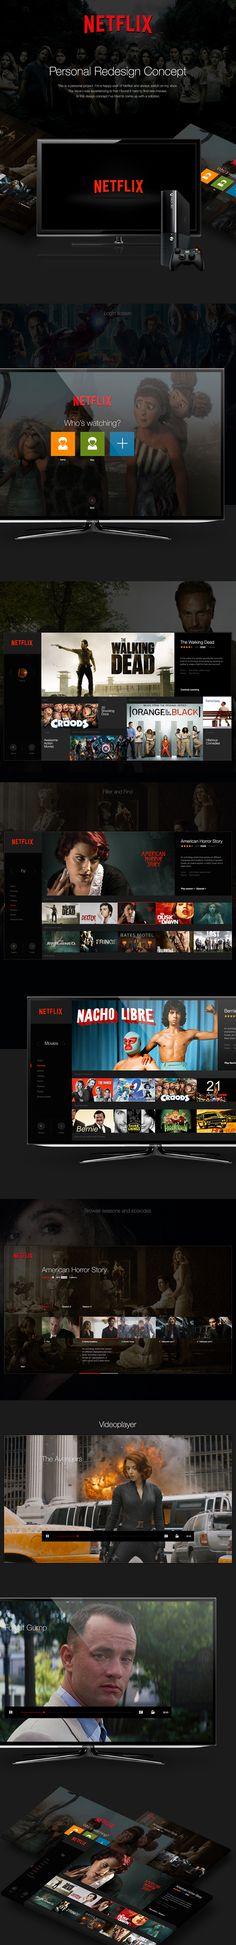 Netflix Concept (personal project) on Behance Web Design, App Ui Design, User Interface Design, Graphic Design, Netflix, Secret Boards, Tv App, Digital Tv, Interactive Design